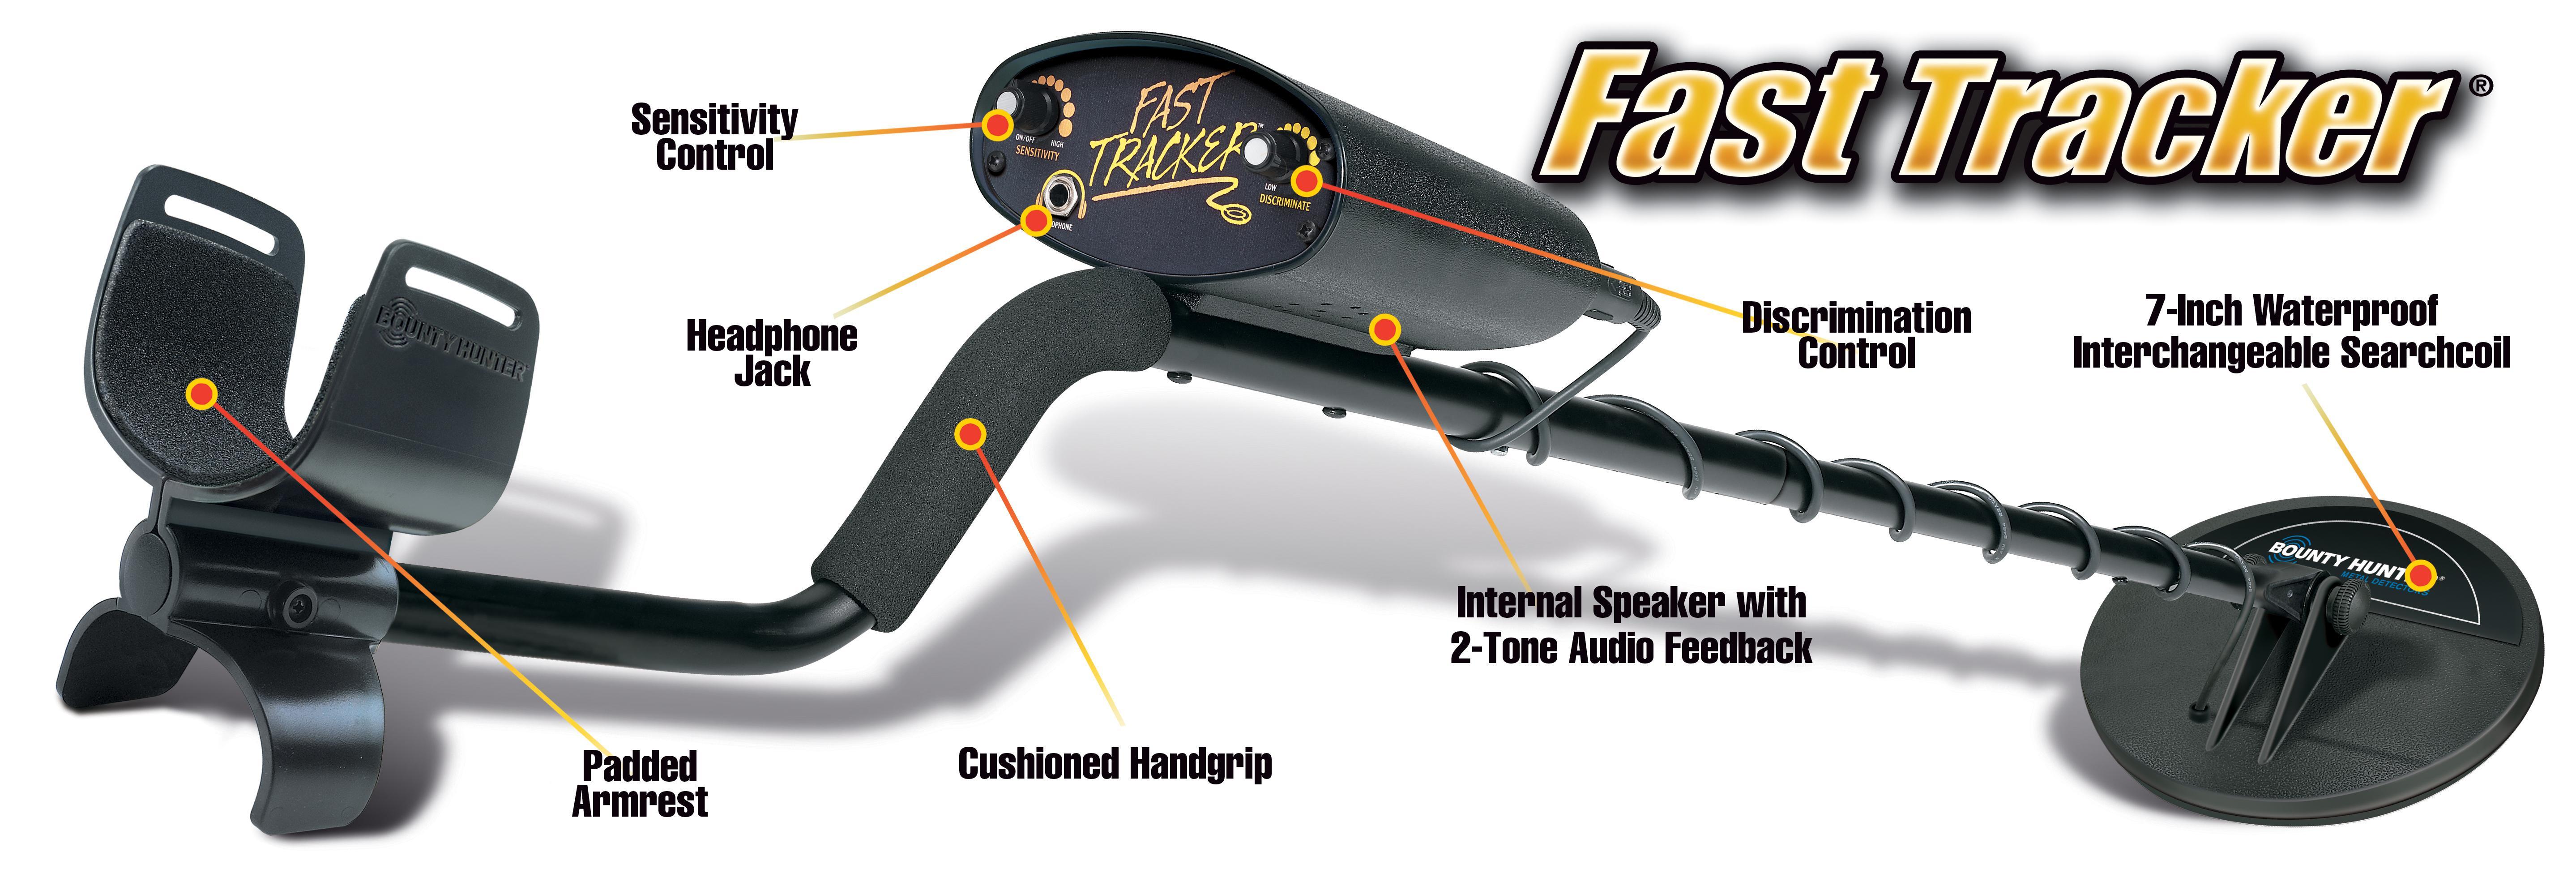 amazon com bounty hunter fast tracker metal detector 7 inch rh amazon com Real Bounty Hunters Bounty Hunter Logo